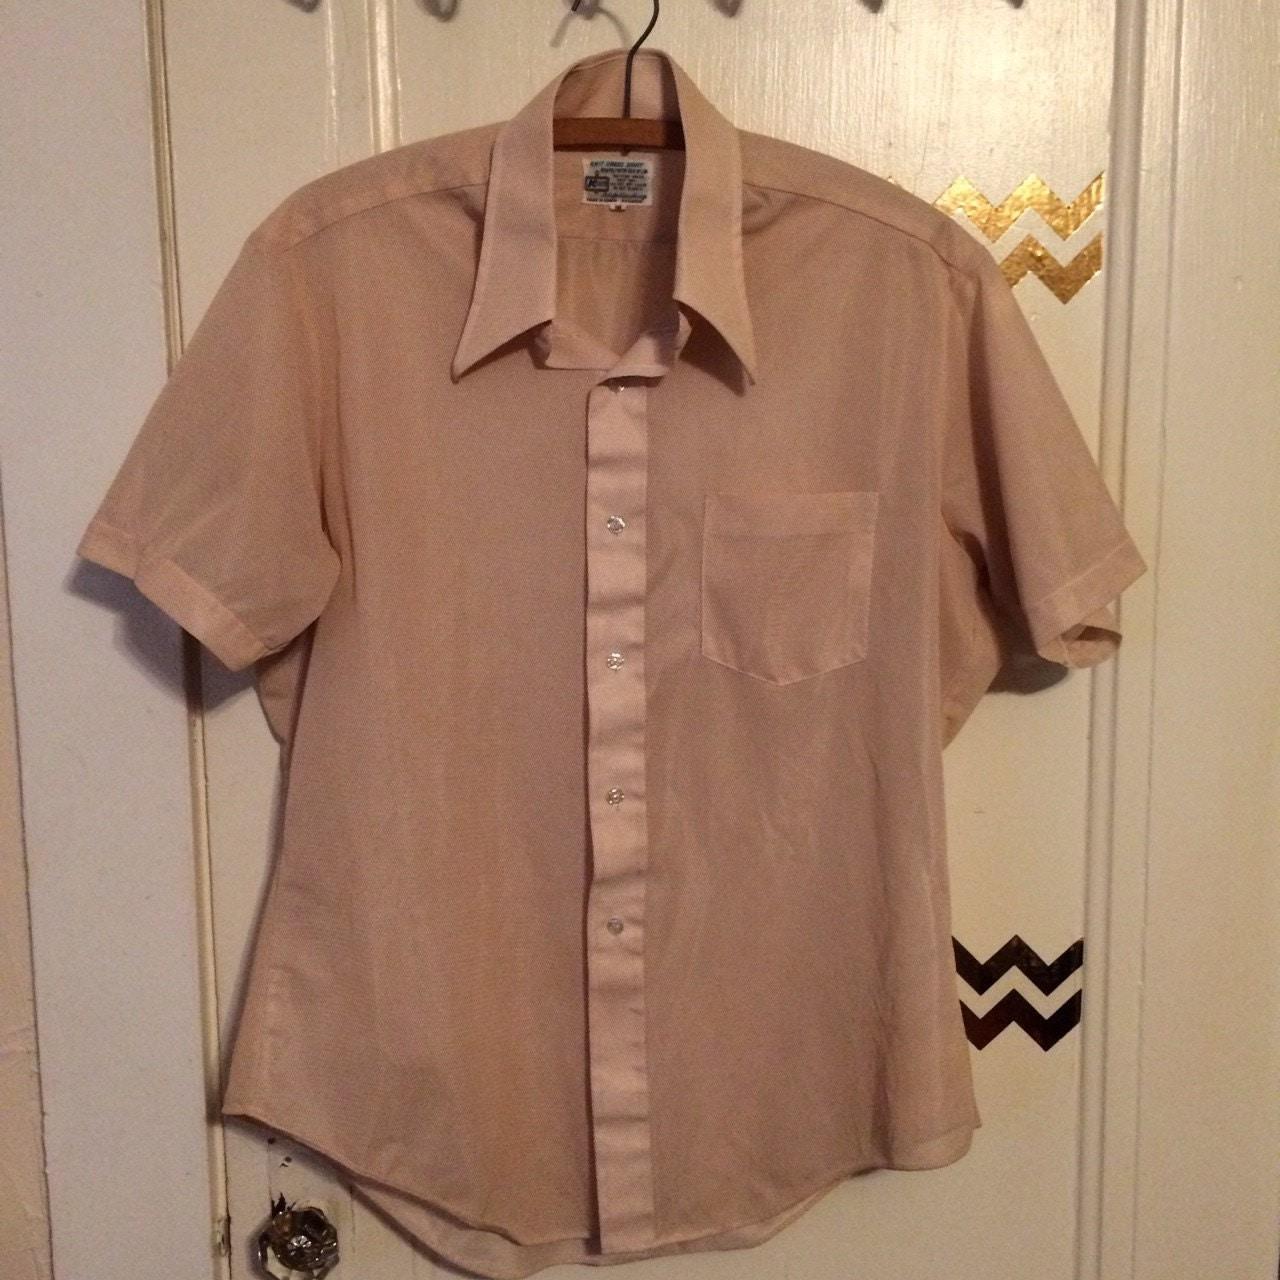 Vintage kmart men 39 s beige short sleeve button down shirt for Kmart button up shirts